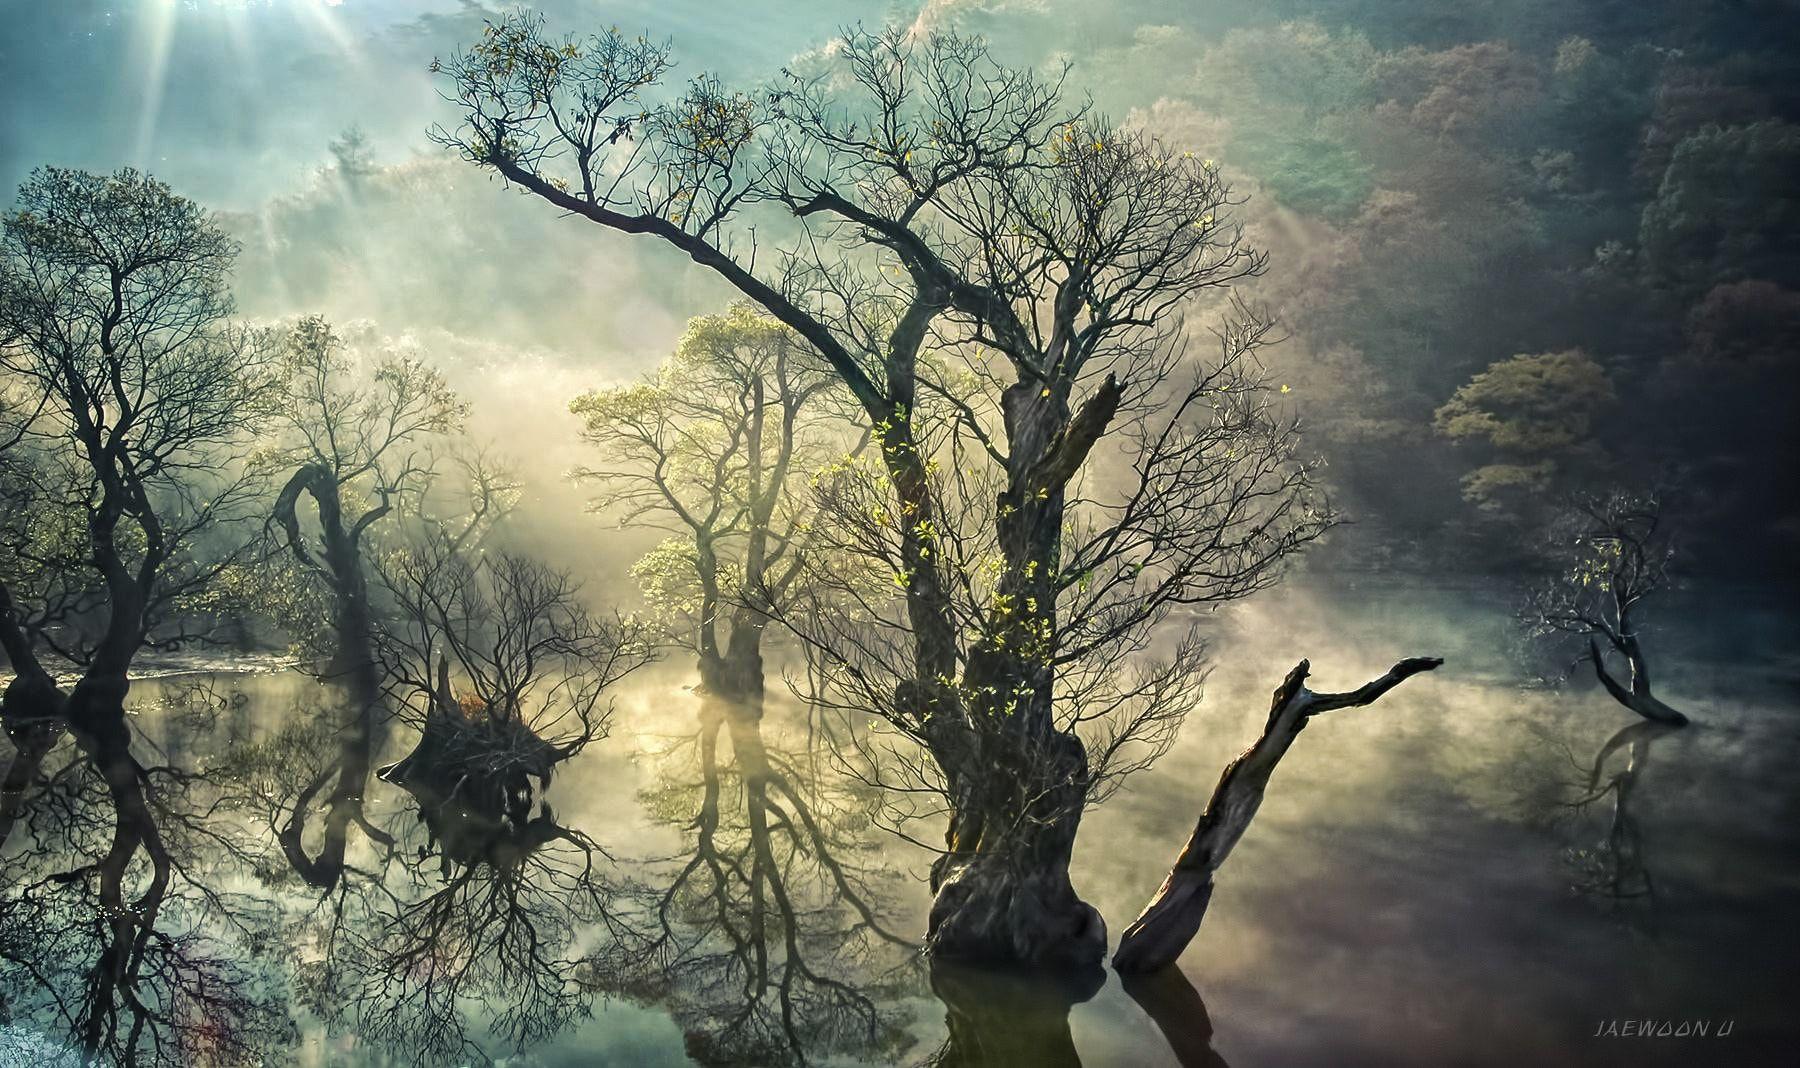 Memory of Jusan lake - 주산지의 기억...